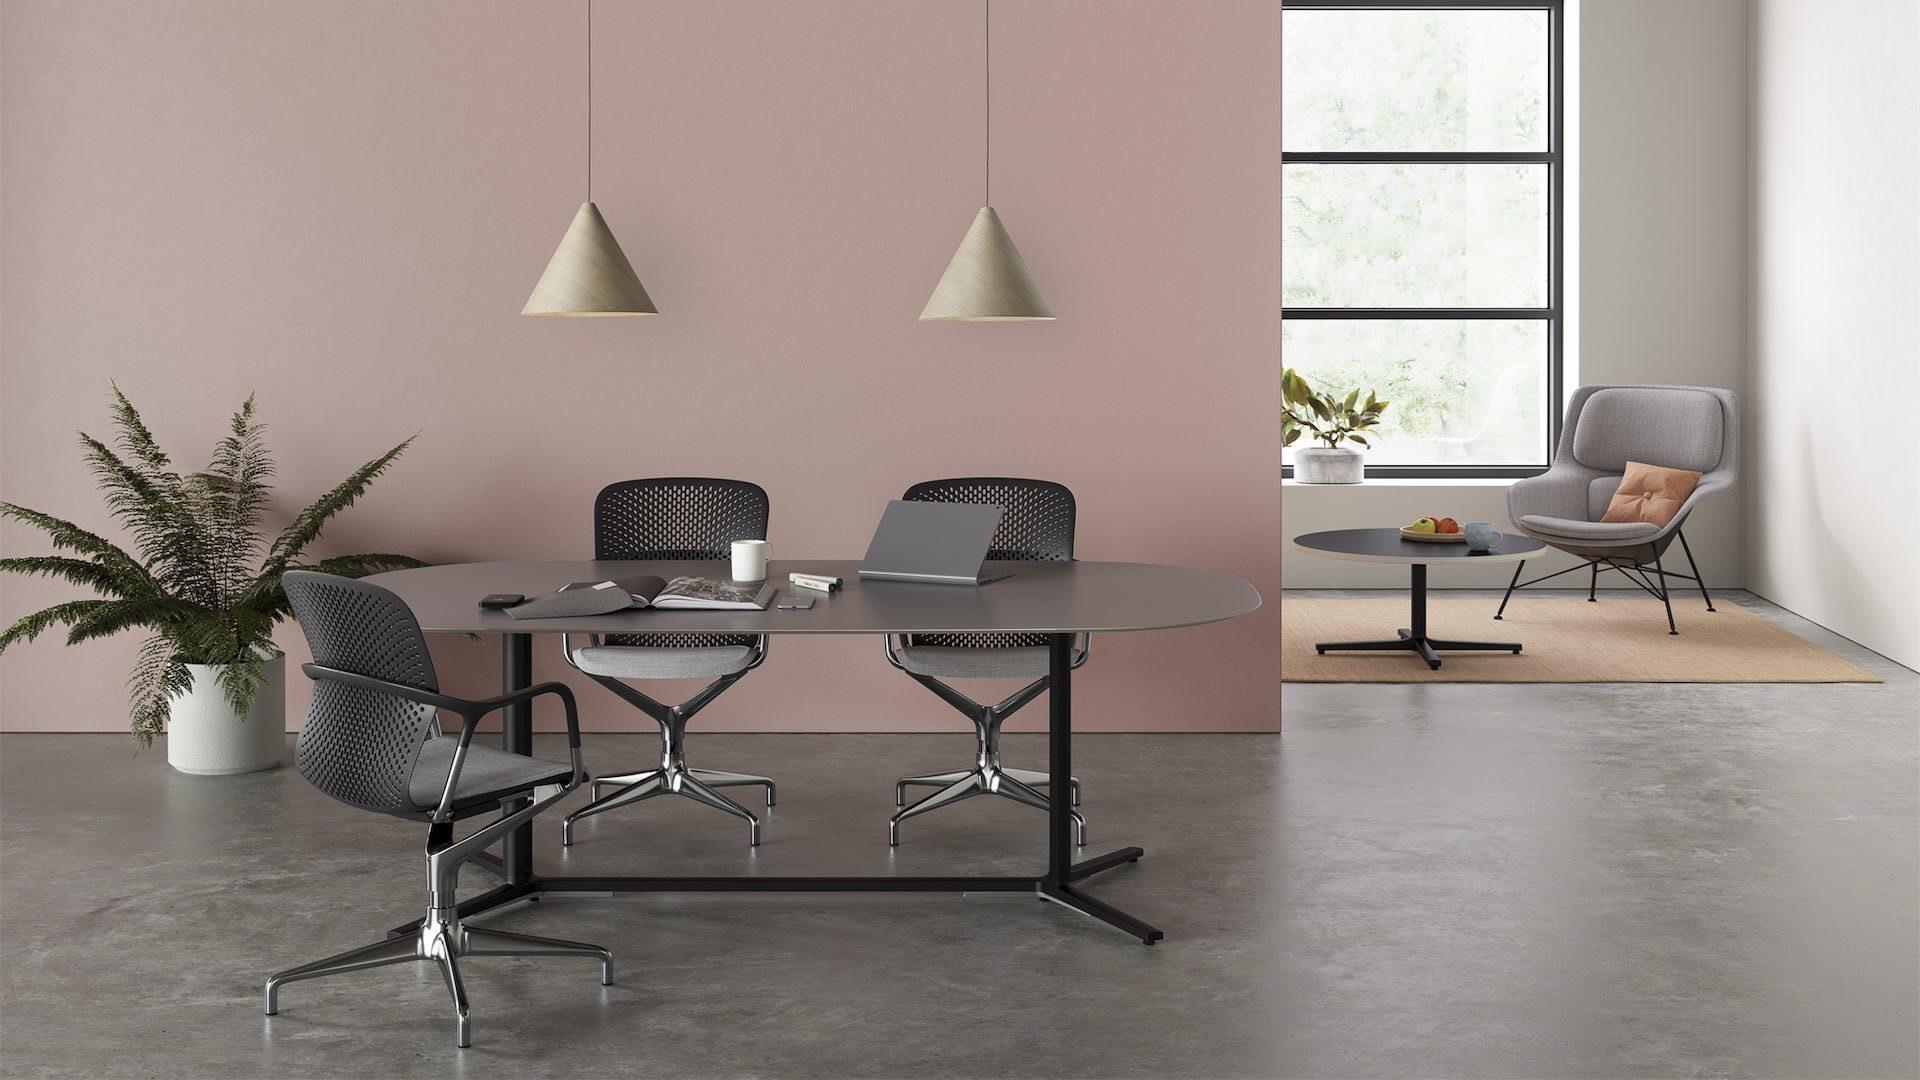 Keyn Chairs & Civic Table